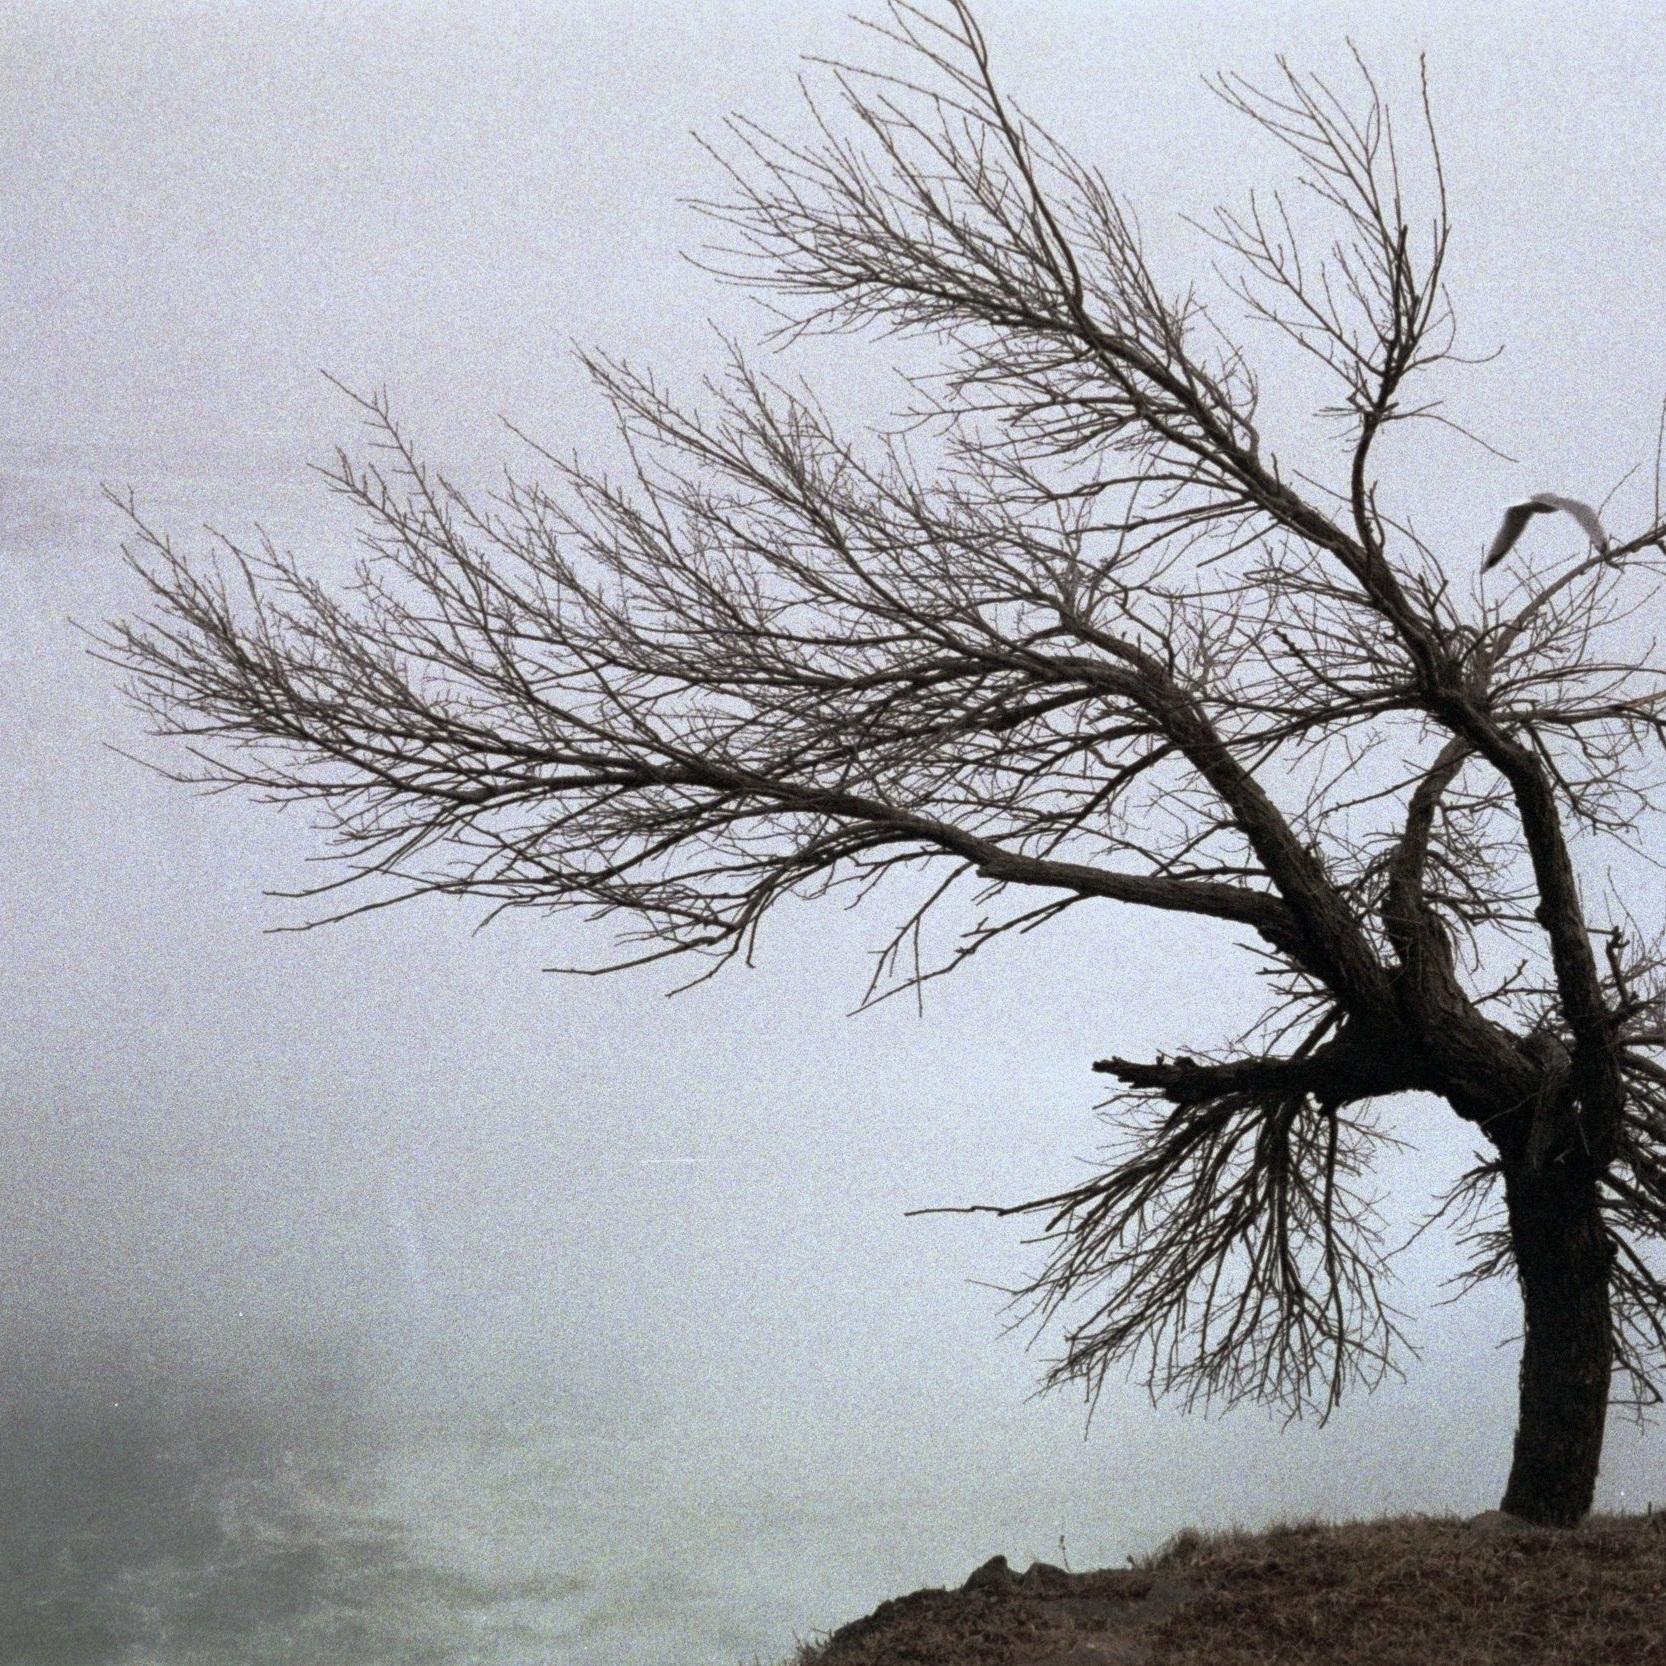 Hiradfar_Maryam_Tree+By+the+Waterfalljpg.jpg